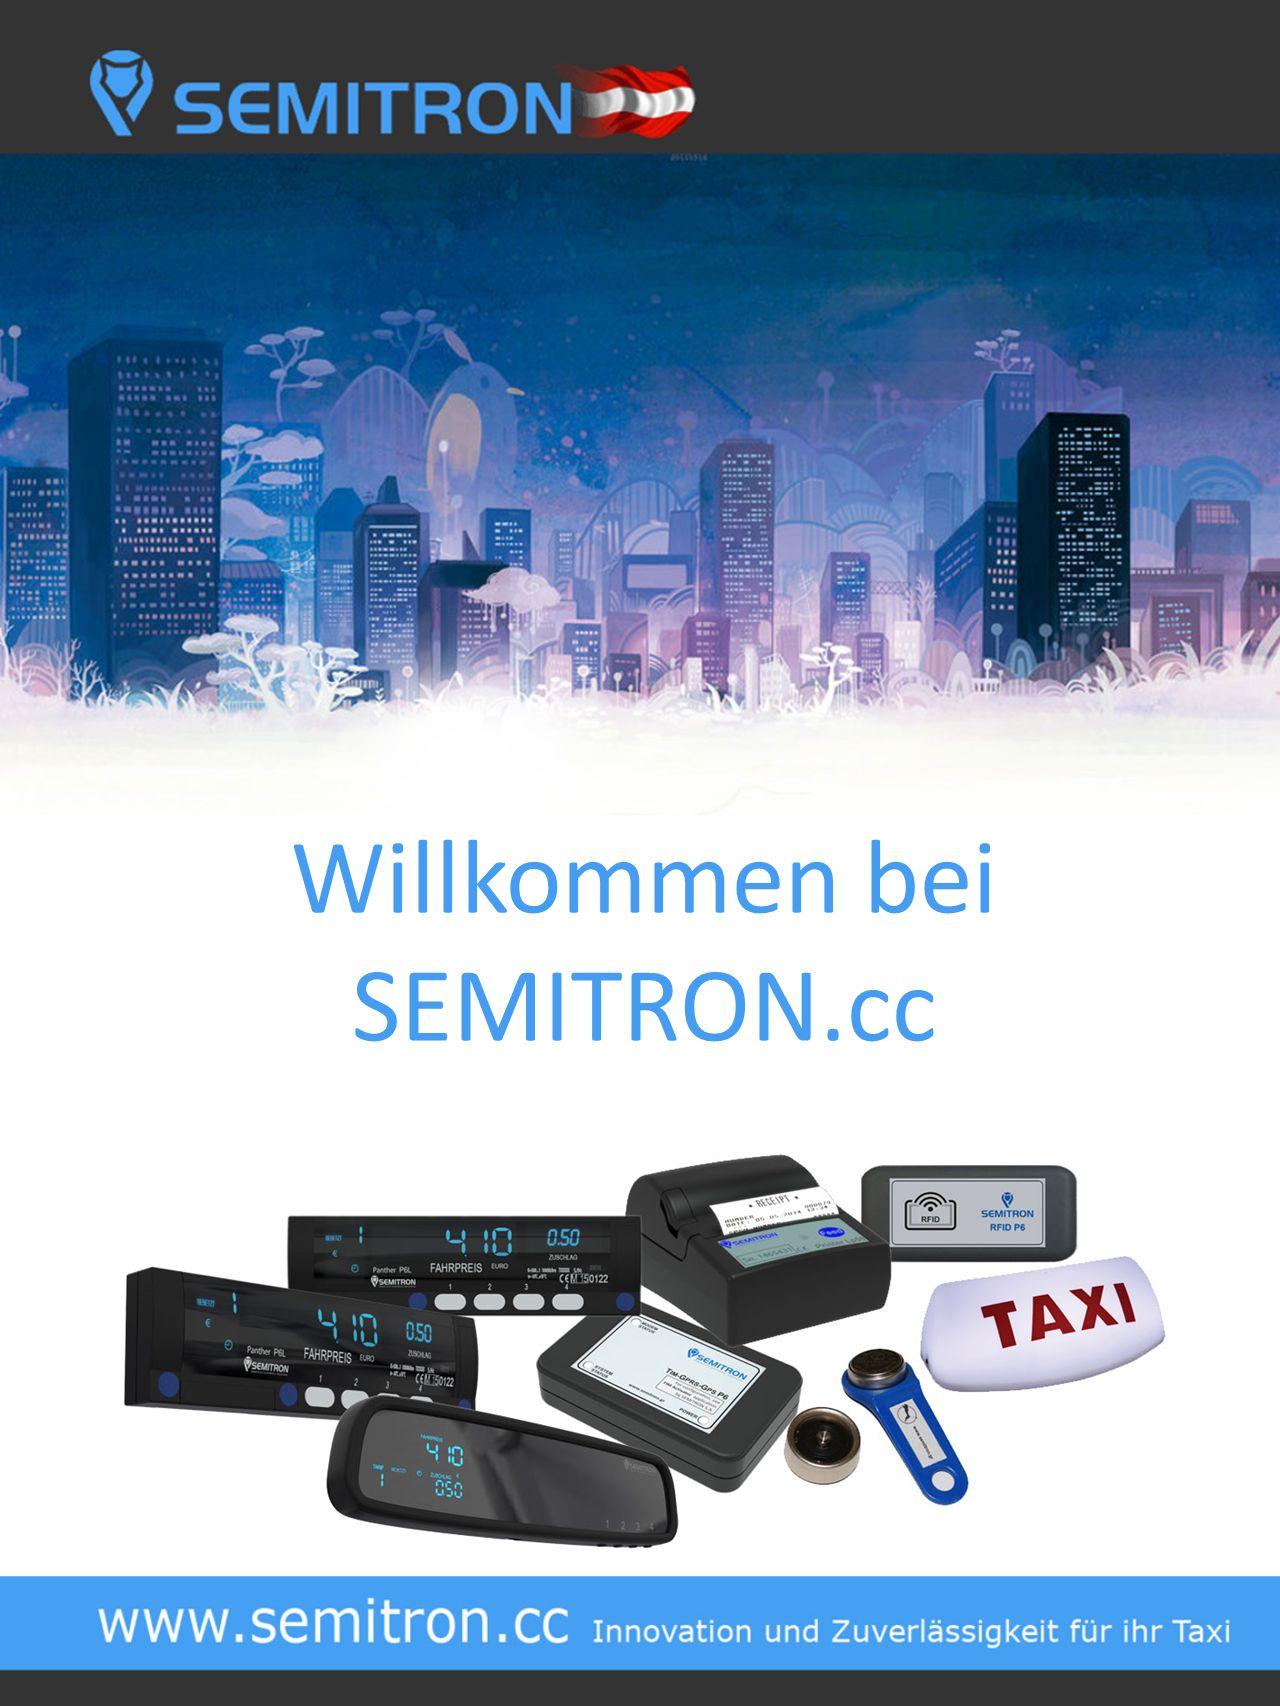 Willkommen bei SEMITRON.cc